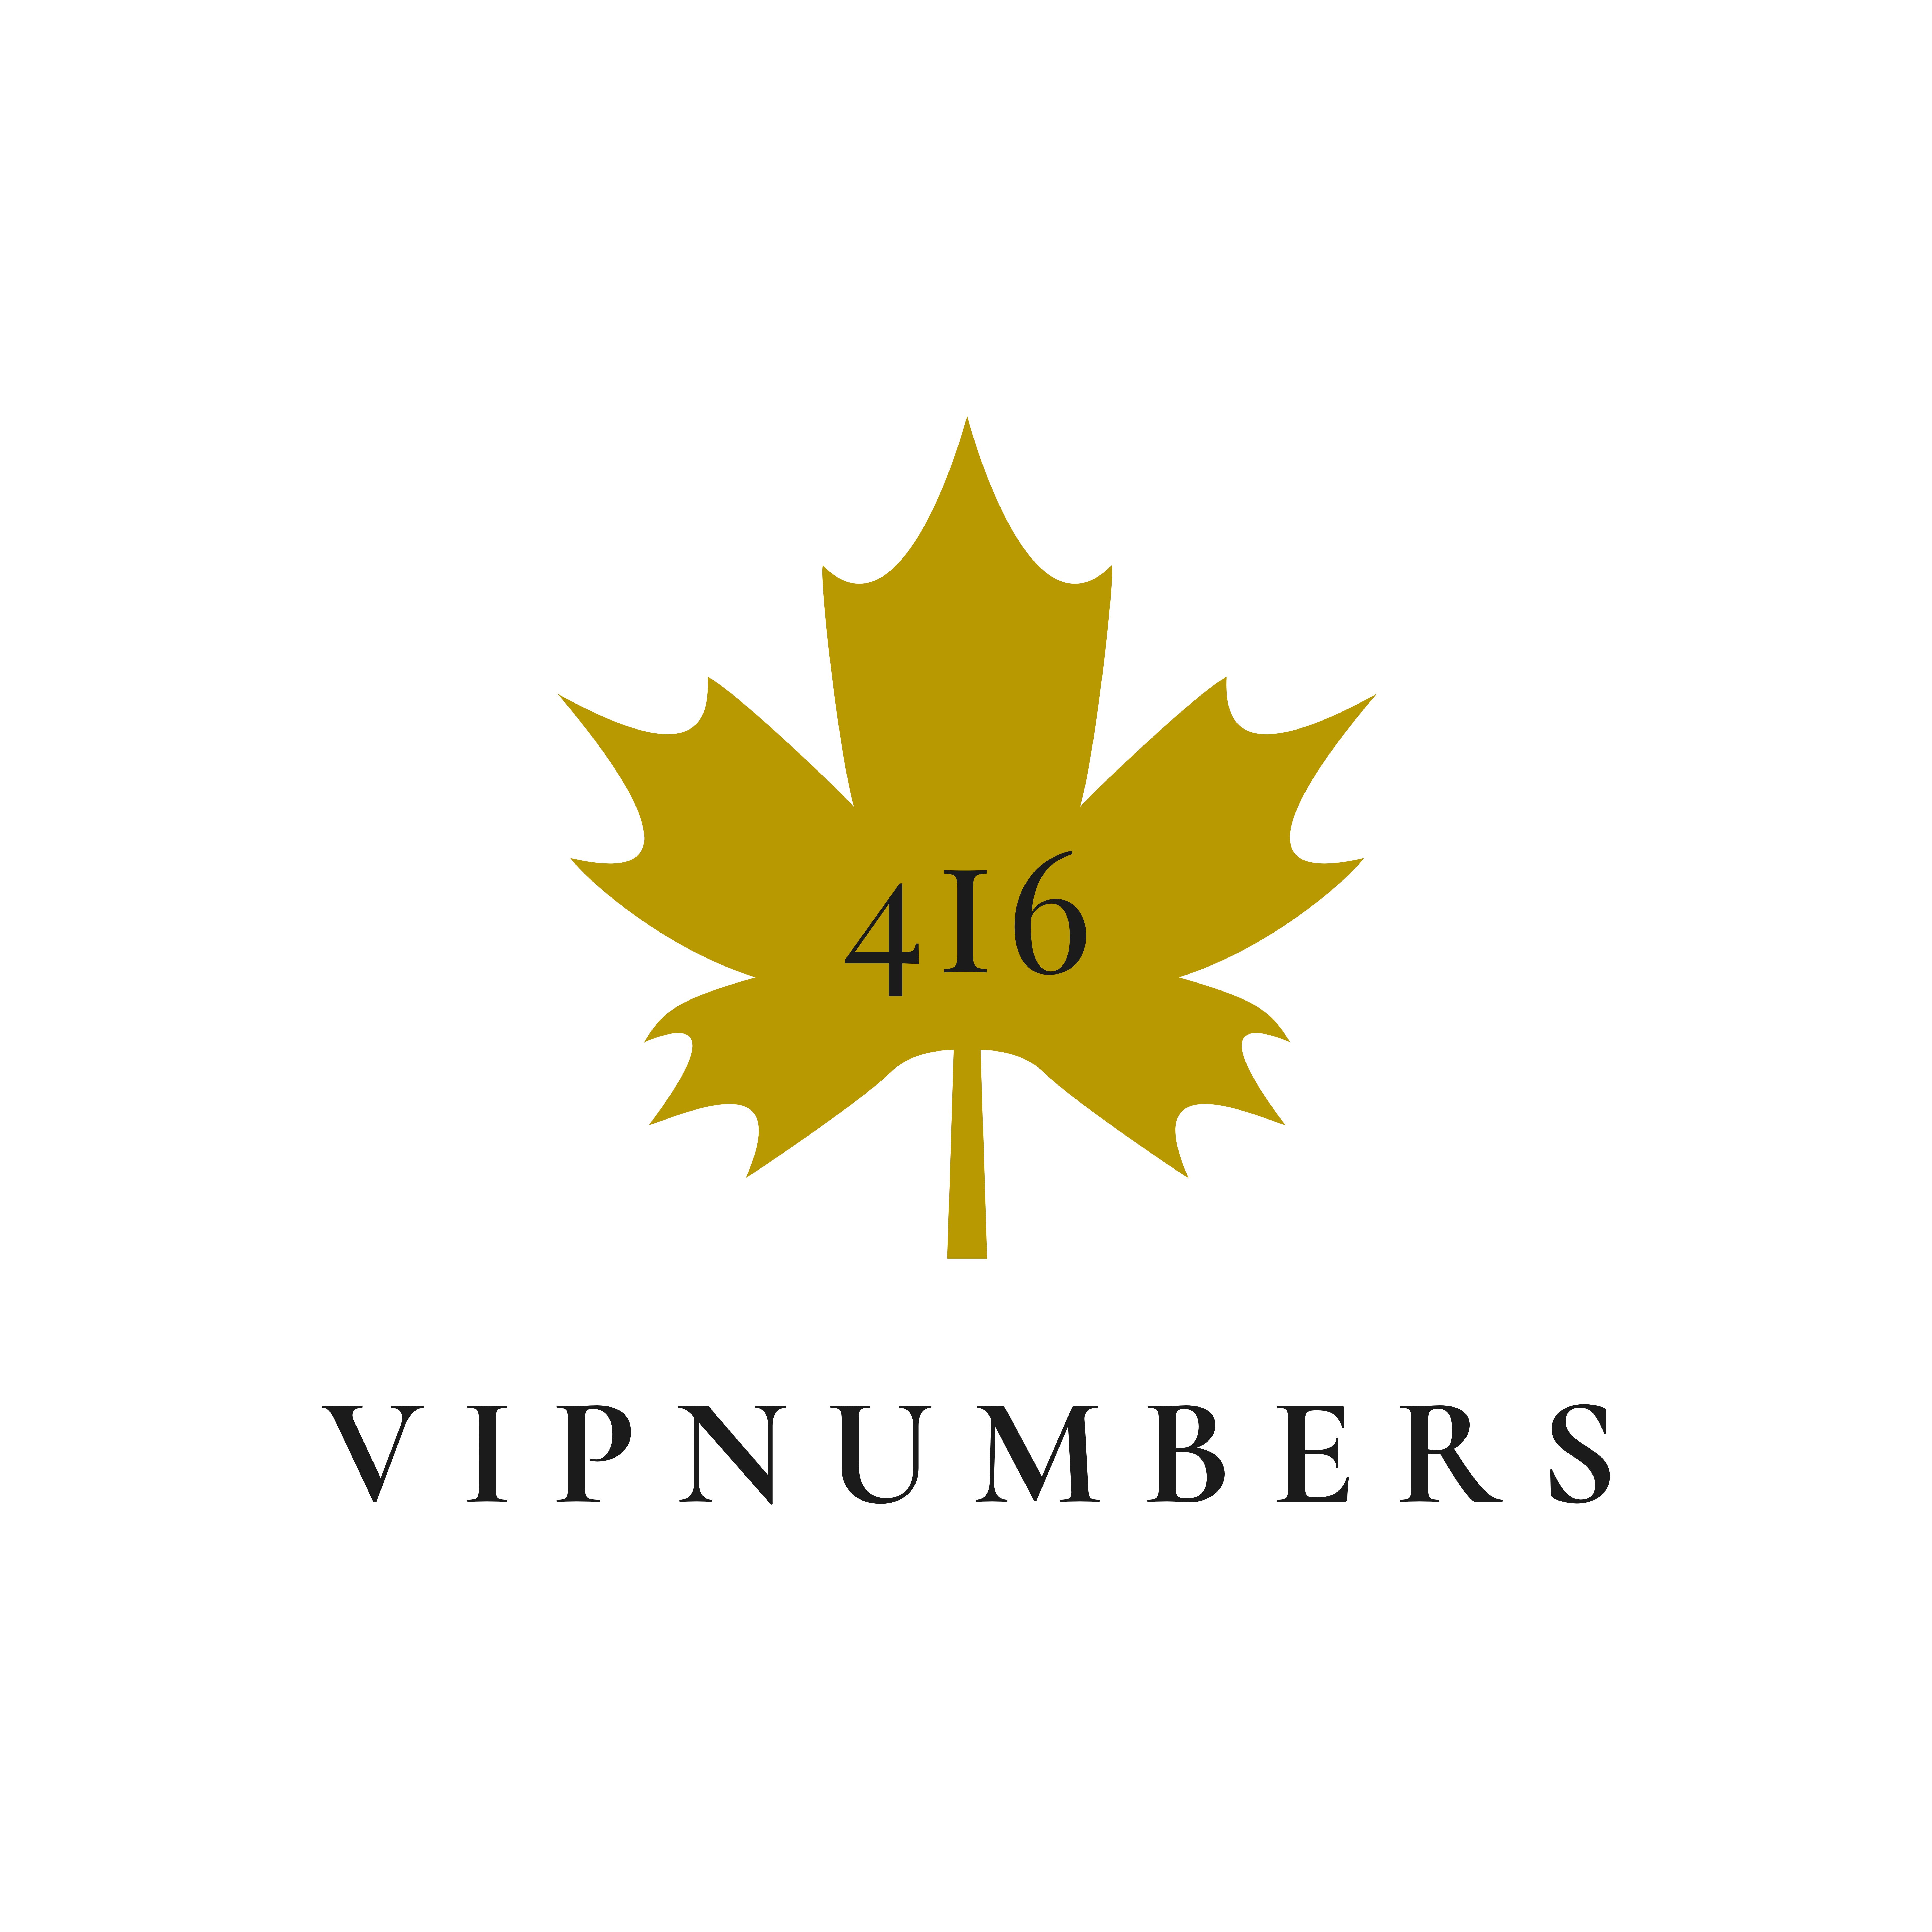 4i6 VIP NUMBERS